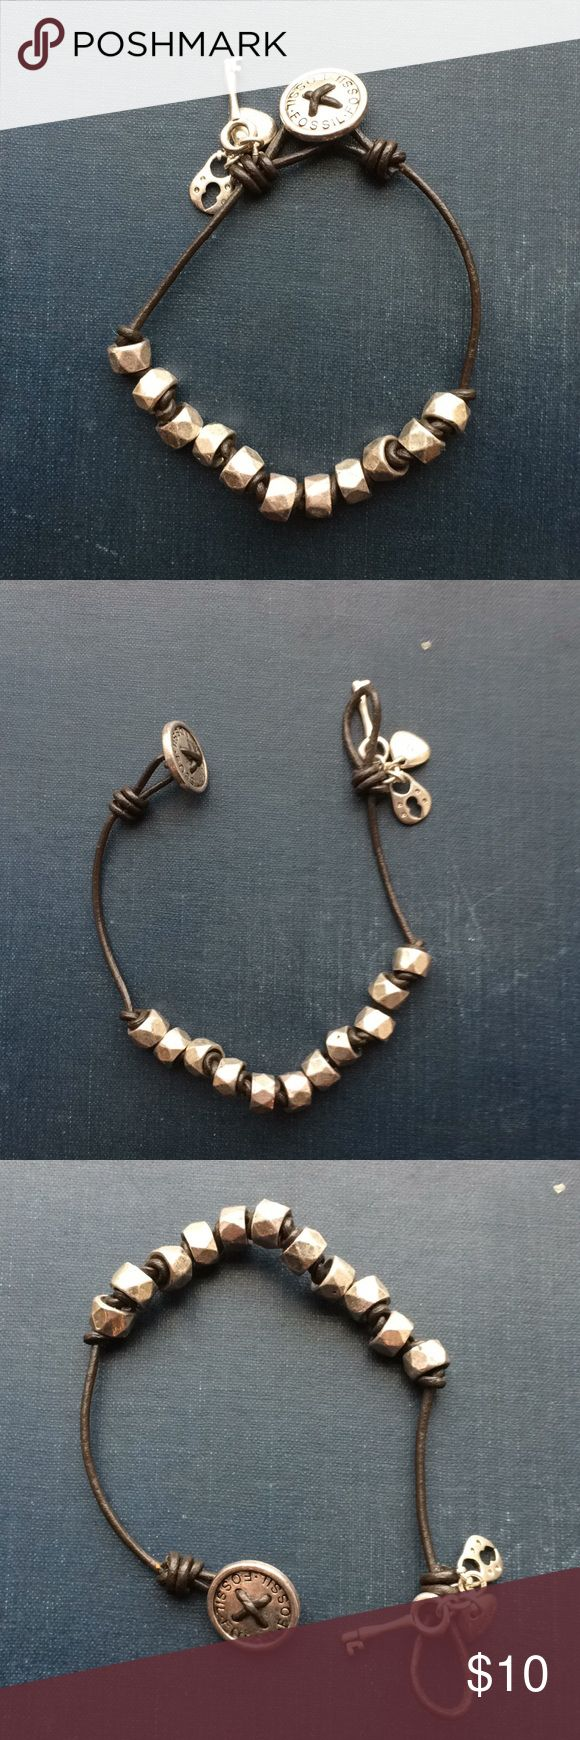 Fossil leather charm wrap silver bead bracelet Fossil leathet bracelet with silver beads and tiny charms. Barely worn. Fossil Jewelry Bracelets